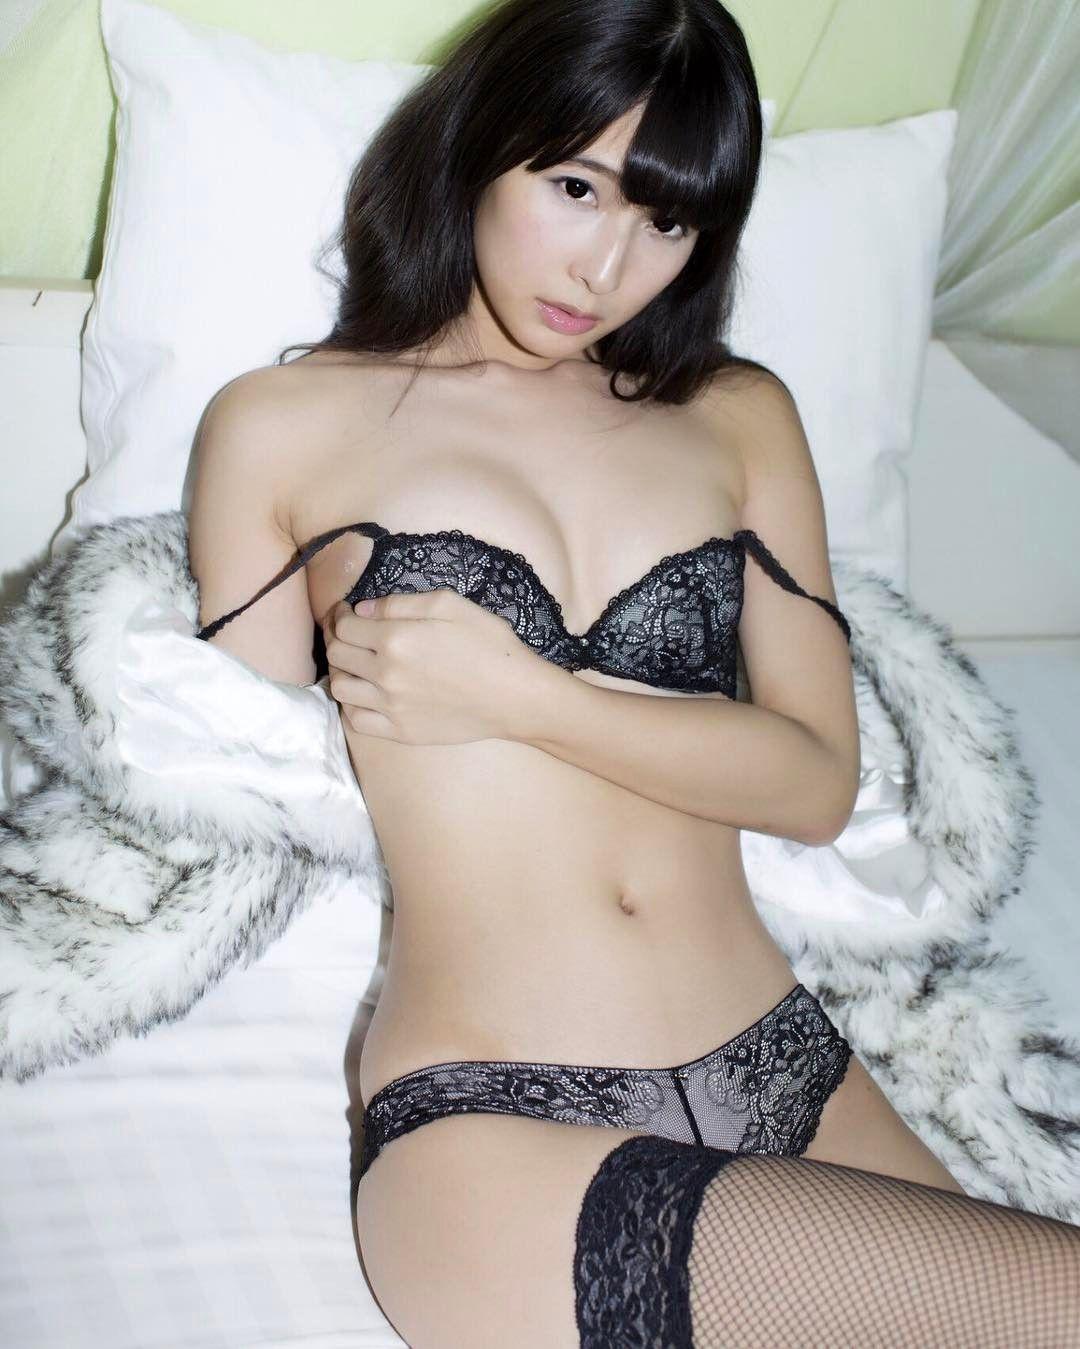 Sexy asian girls in panties